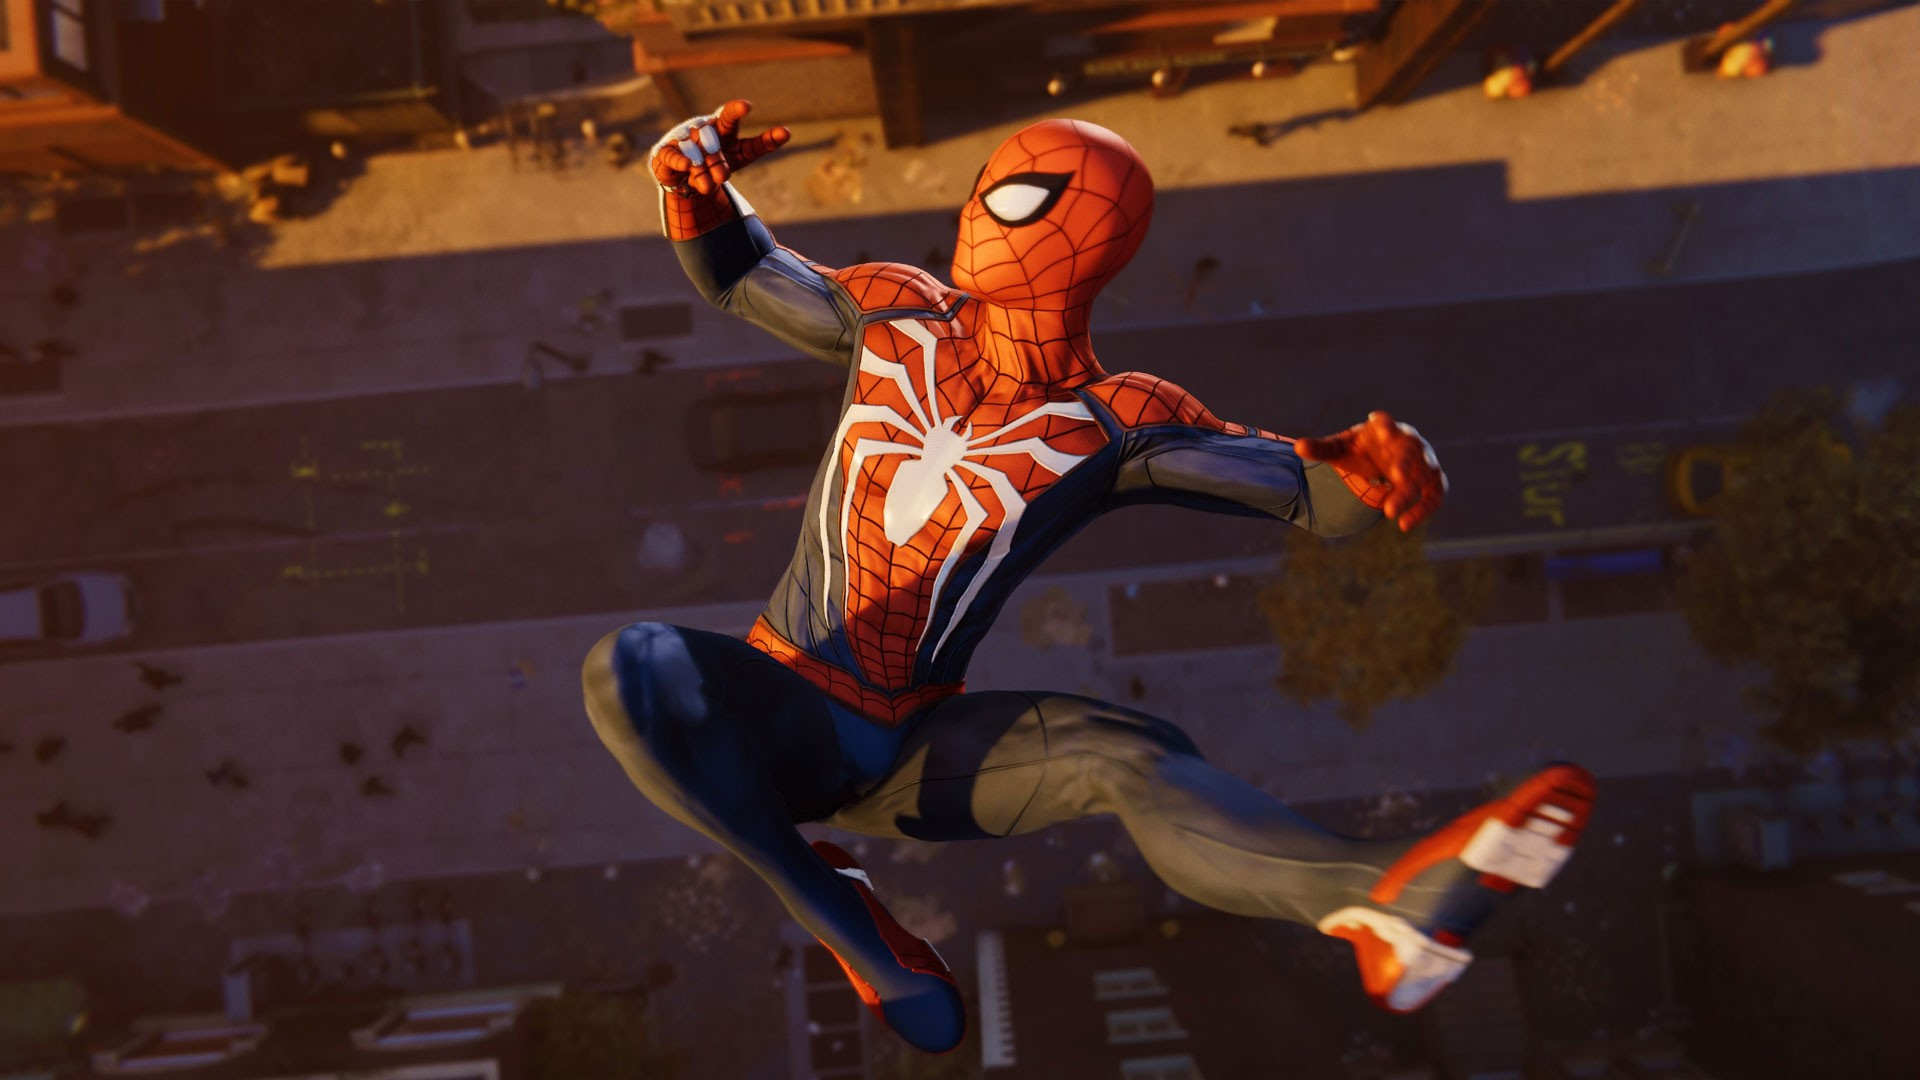 Marvel's Spider-Man PS4 cutscene